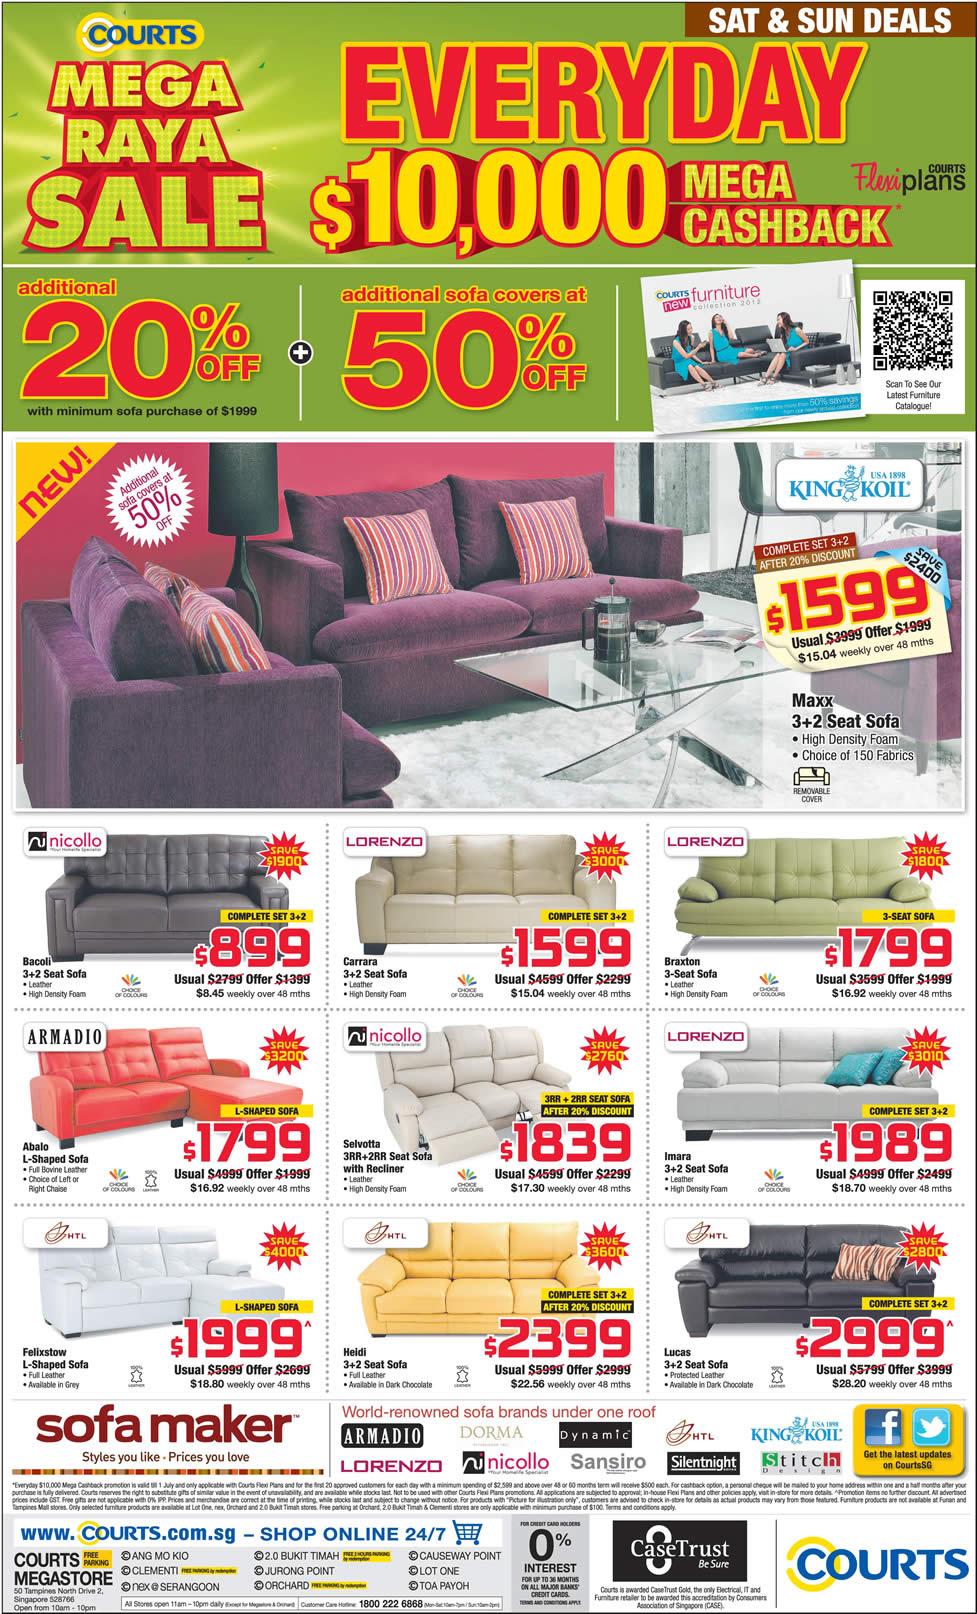 Sofa Sets, Nicollo, Lorenzo, Armadio, HTL